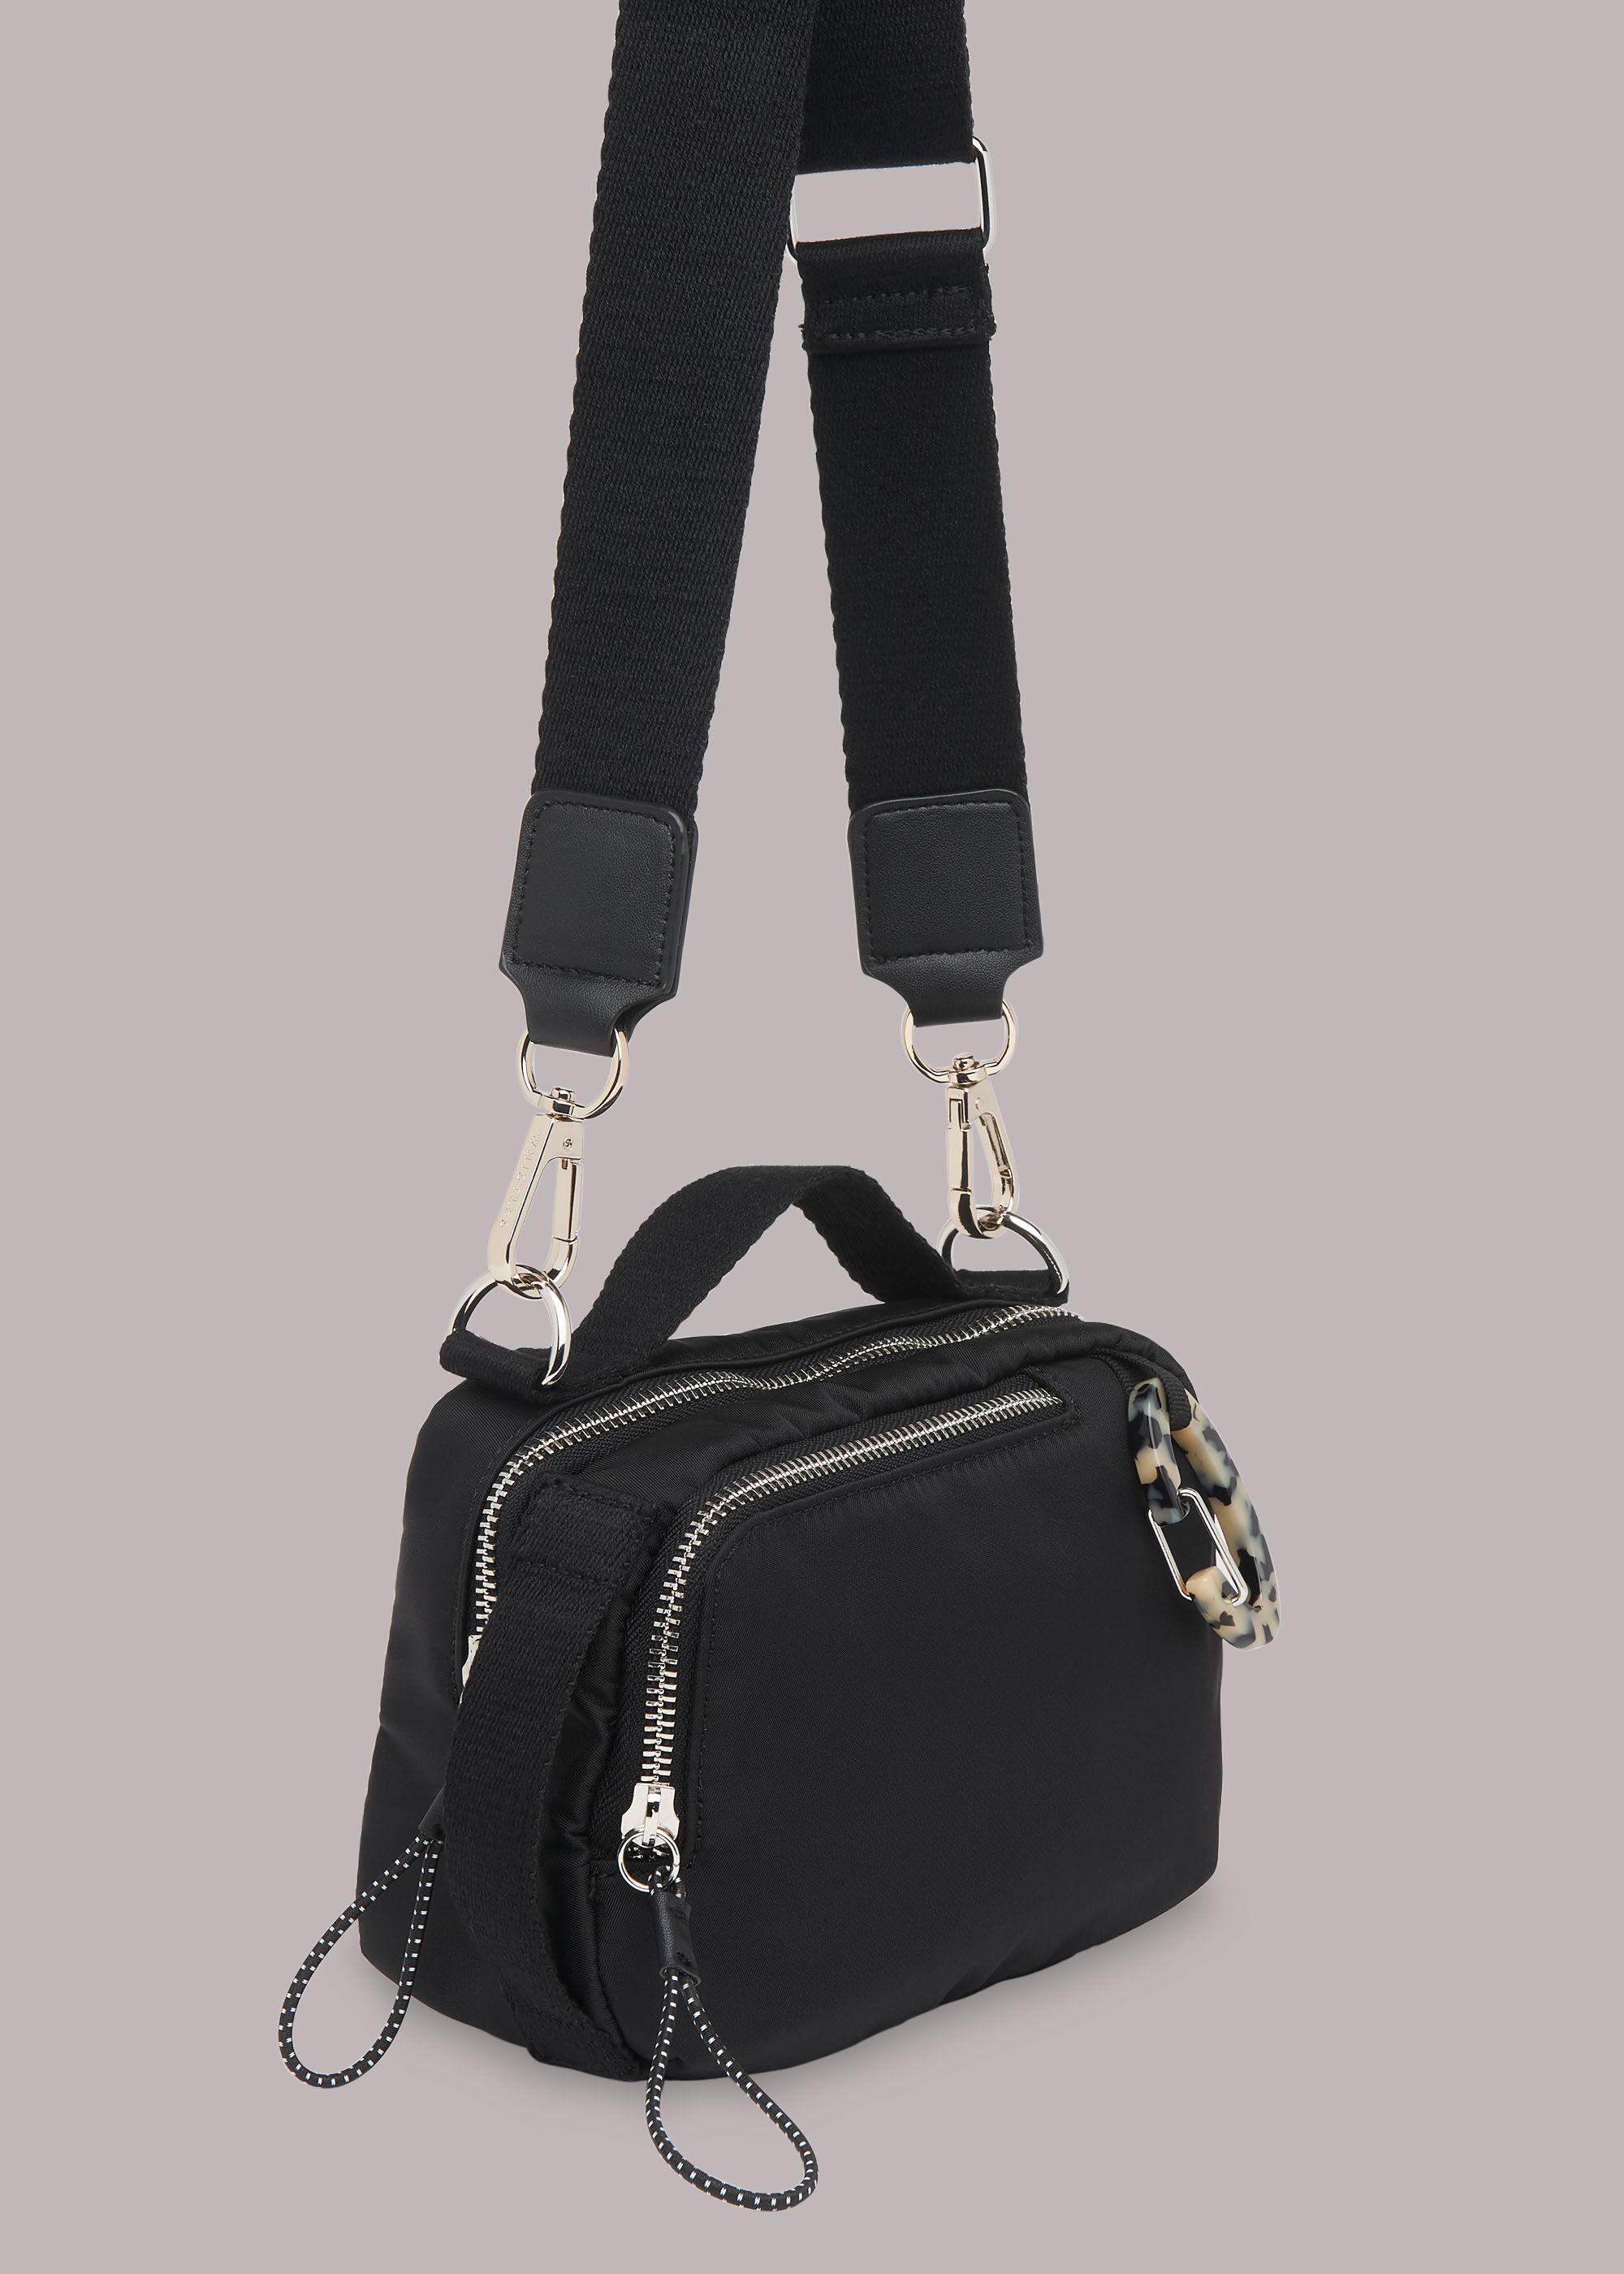 Whistles Women Reilly Nylon Crossbody Bag